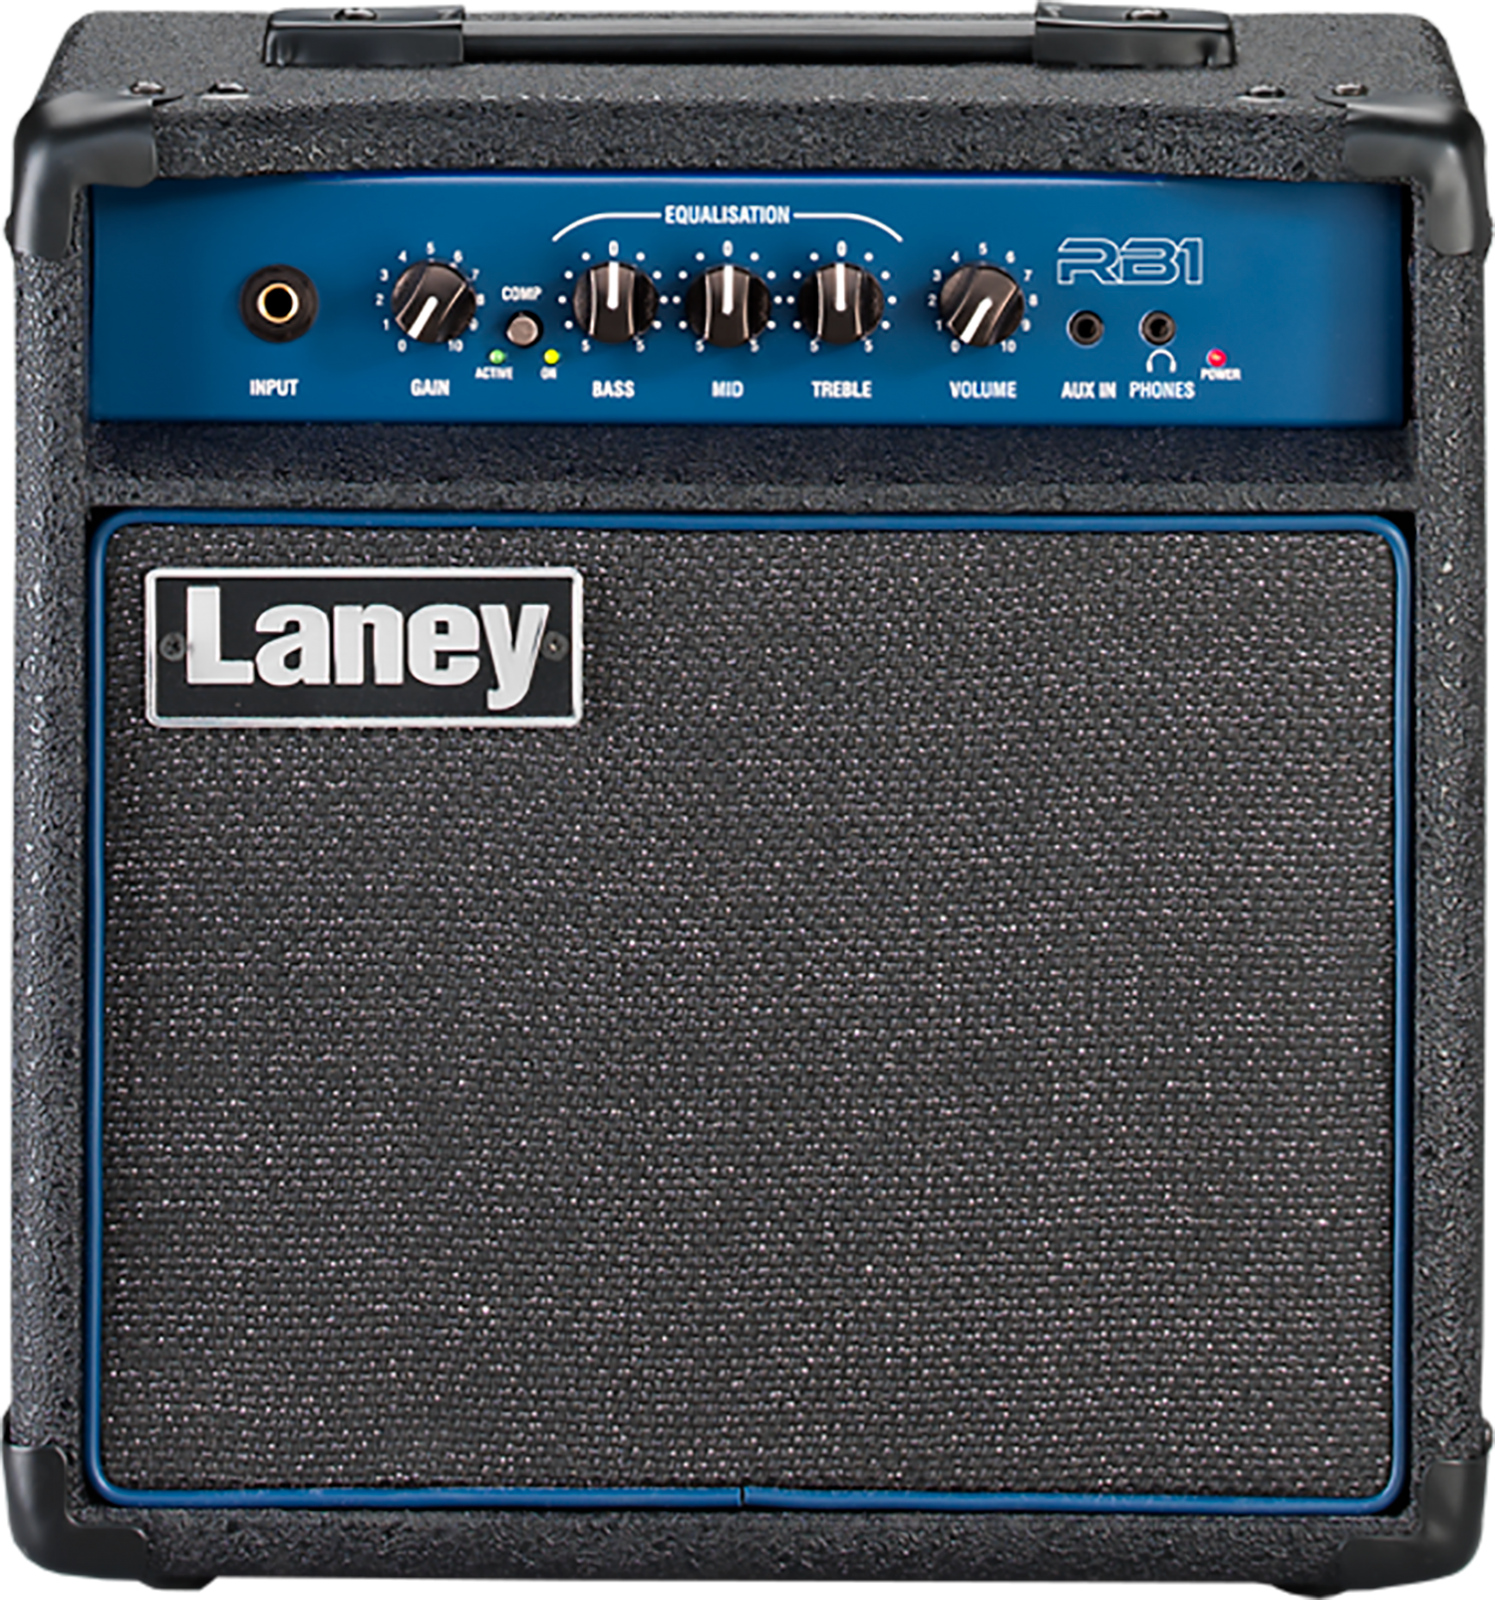 Laney RB1 Richter Bass Amp